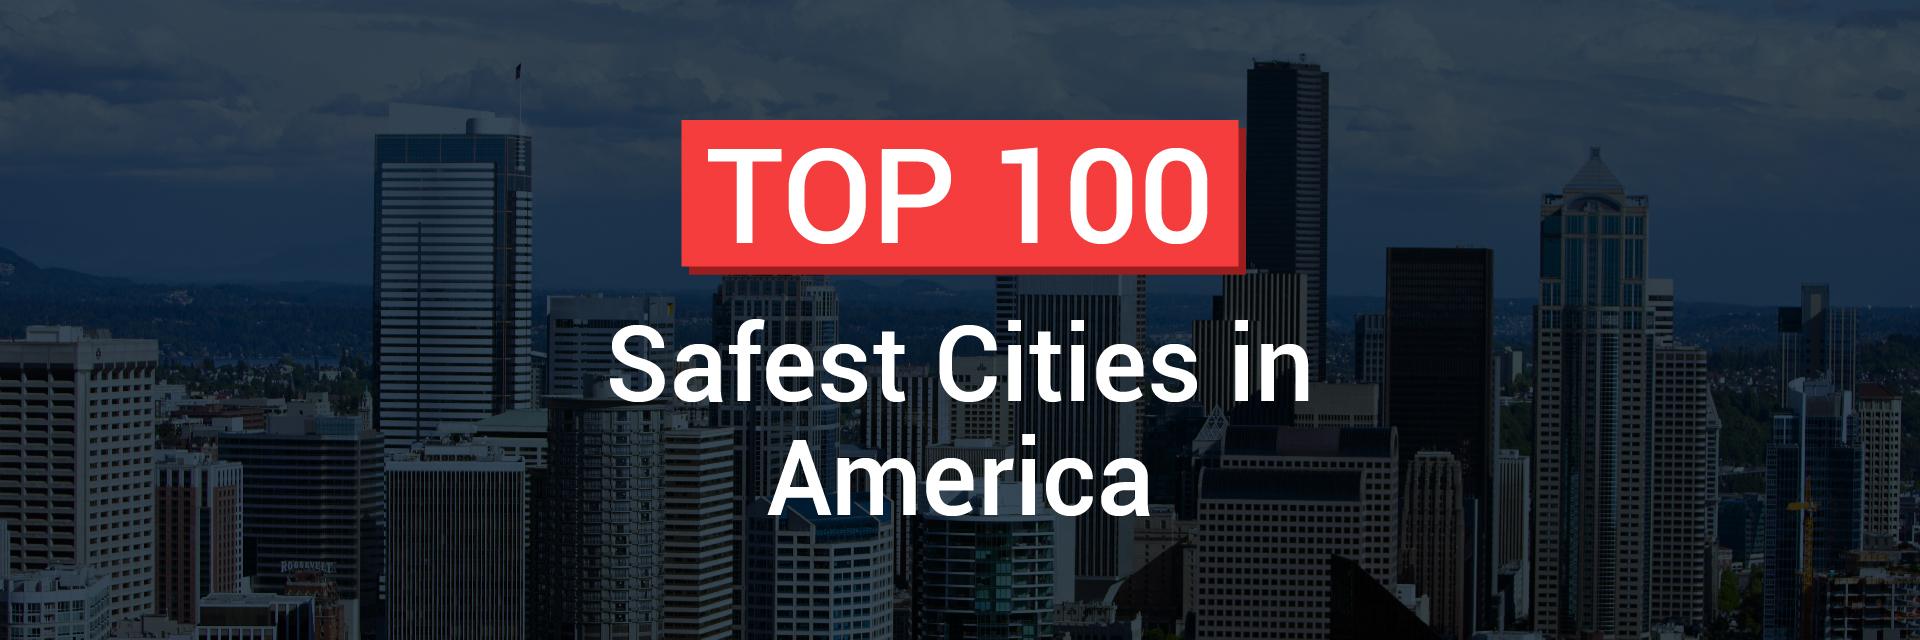 Top 100 Safest Cities In America 2017